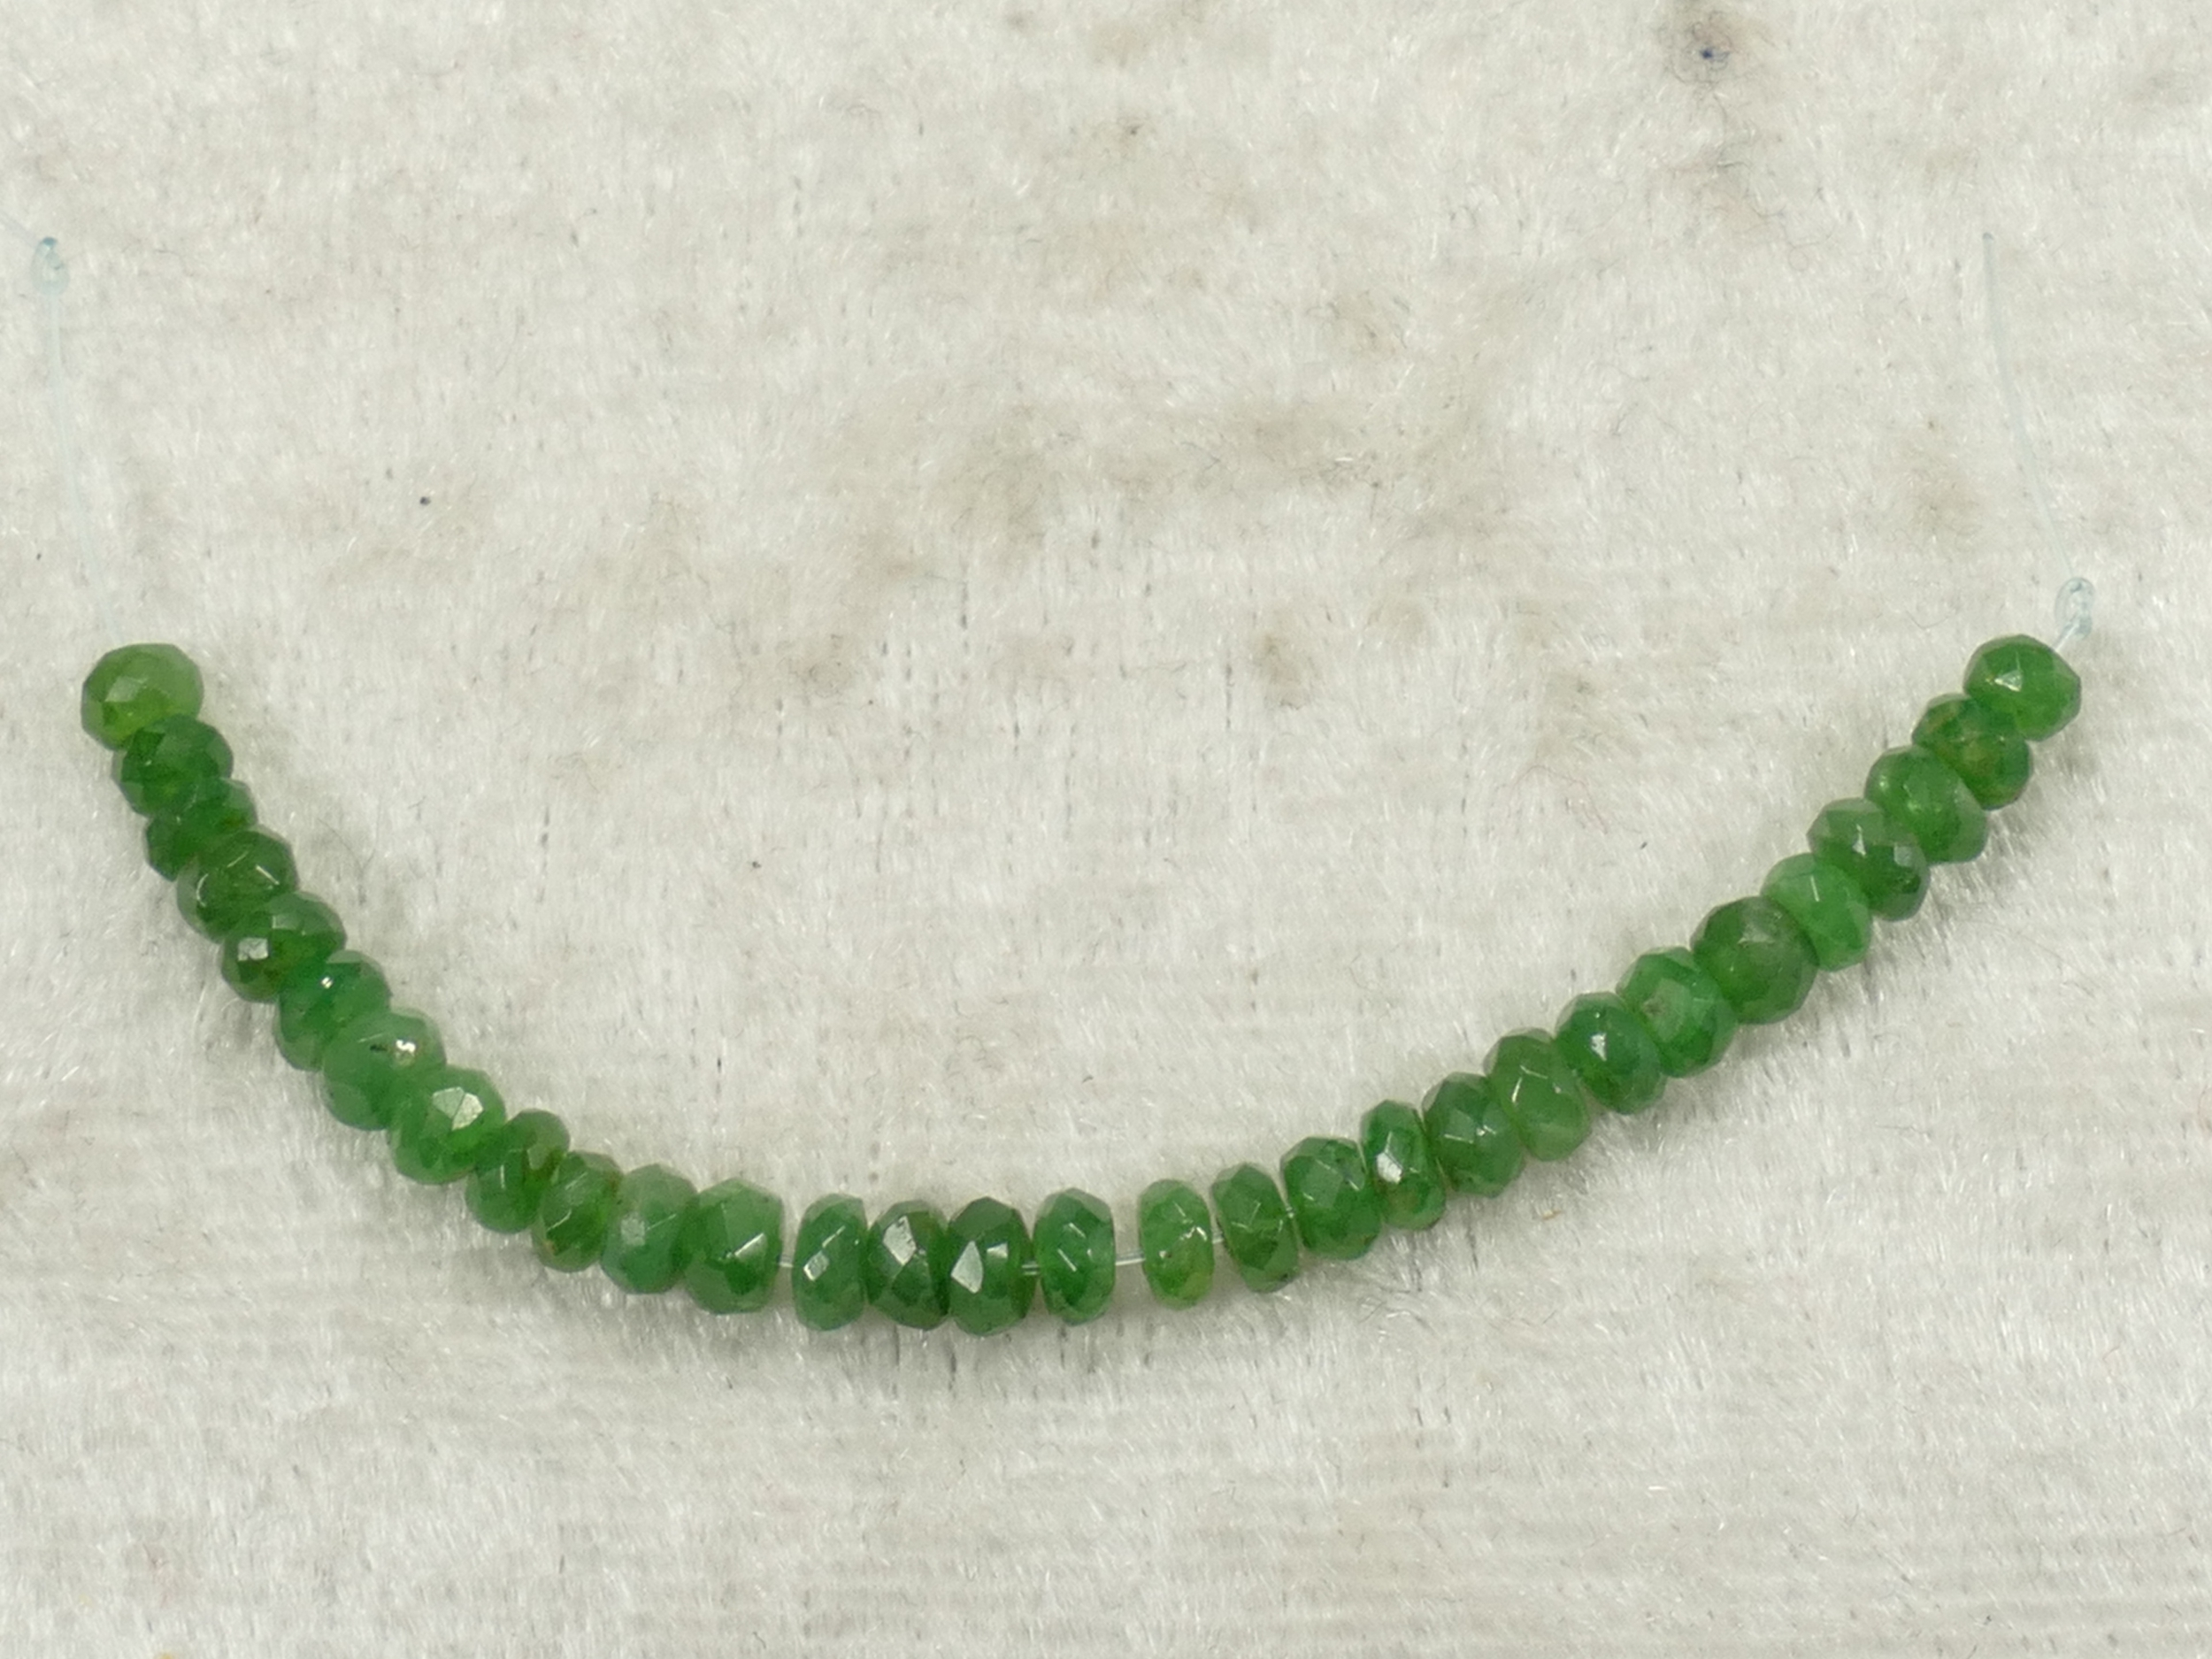 3.5/3.3mm Perles de Grenat vert Tsavorite naturel en rondelle facettée du Kenya 6cm (2.35inch) (#PK936)